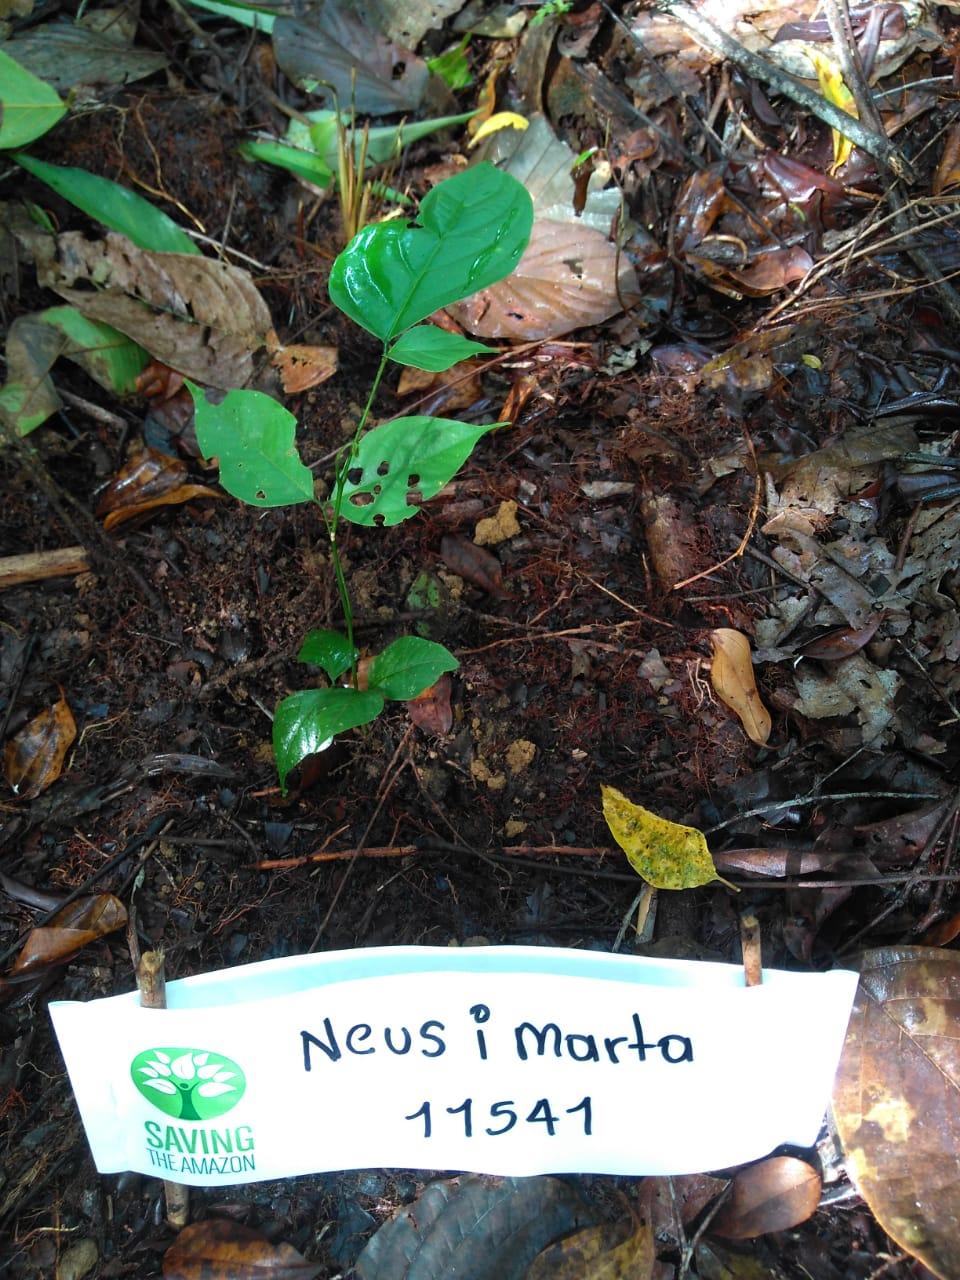 Marta Quevedo Oltra